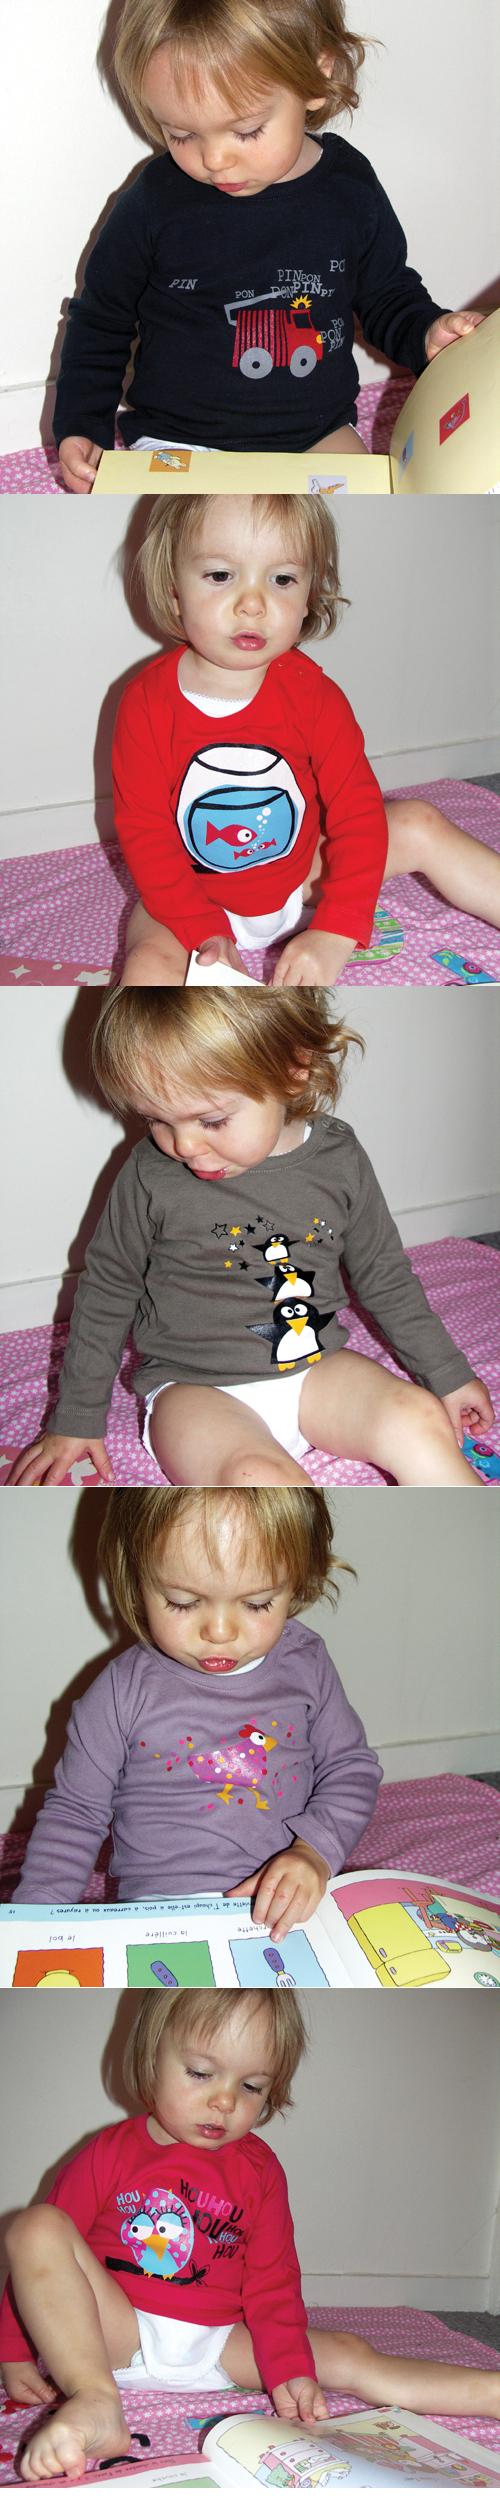 Ninon-T-shirtSerig